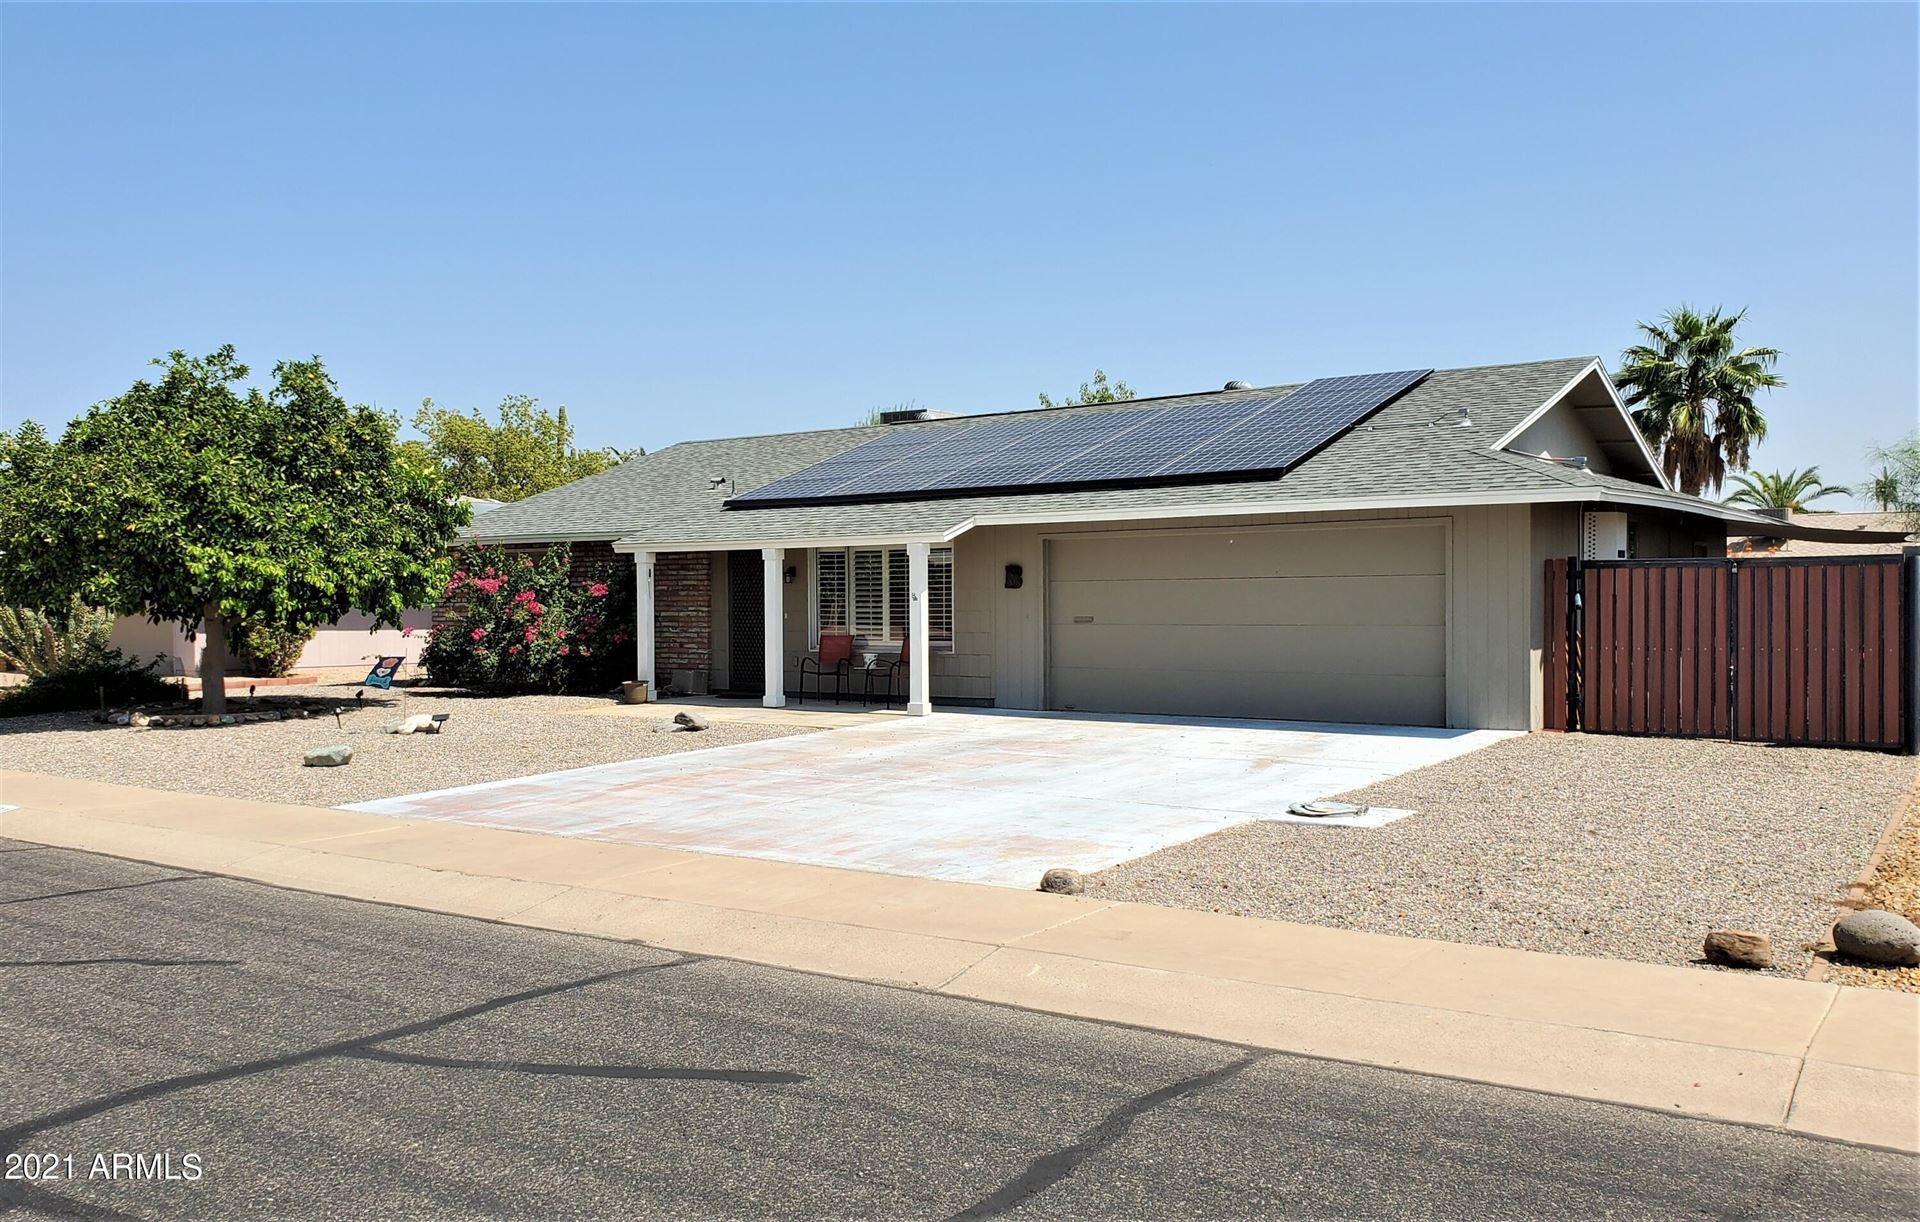 Photo of 19601 N SIGNAL BUTTE Circle, Sun City, AZ 85373 (MLS # 6295153)